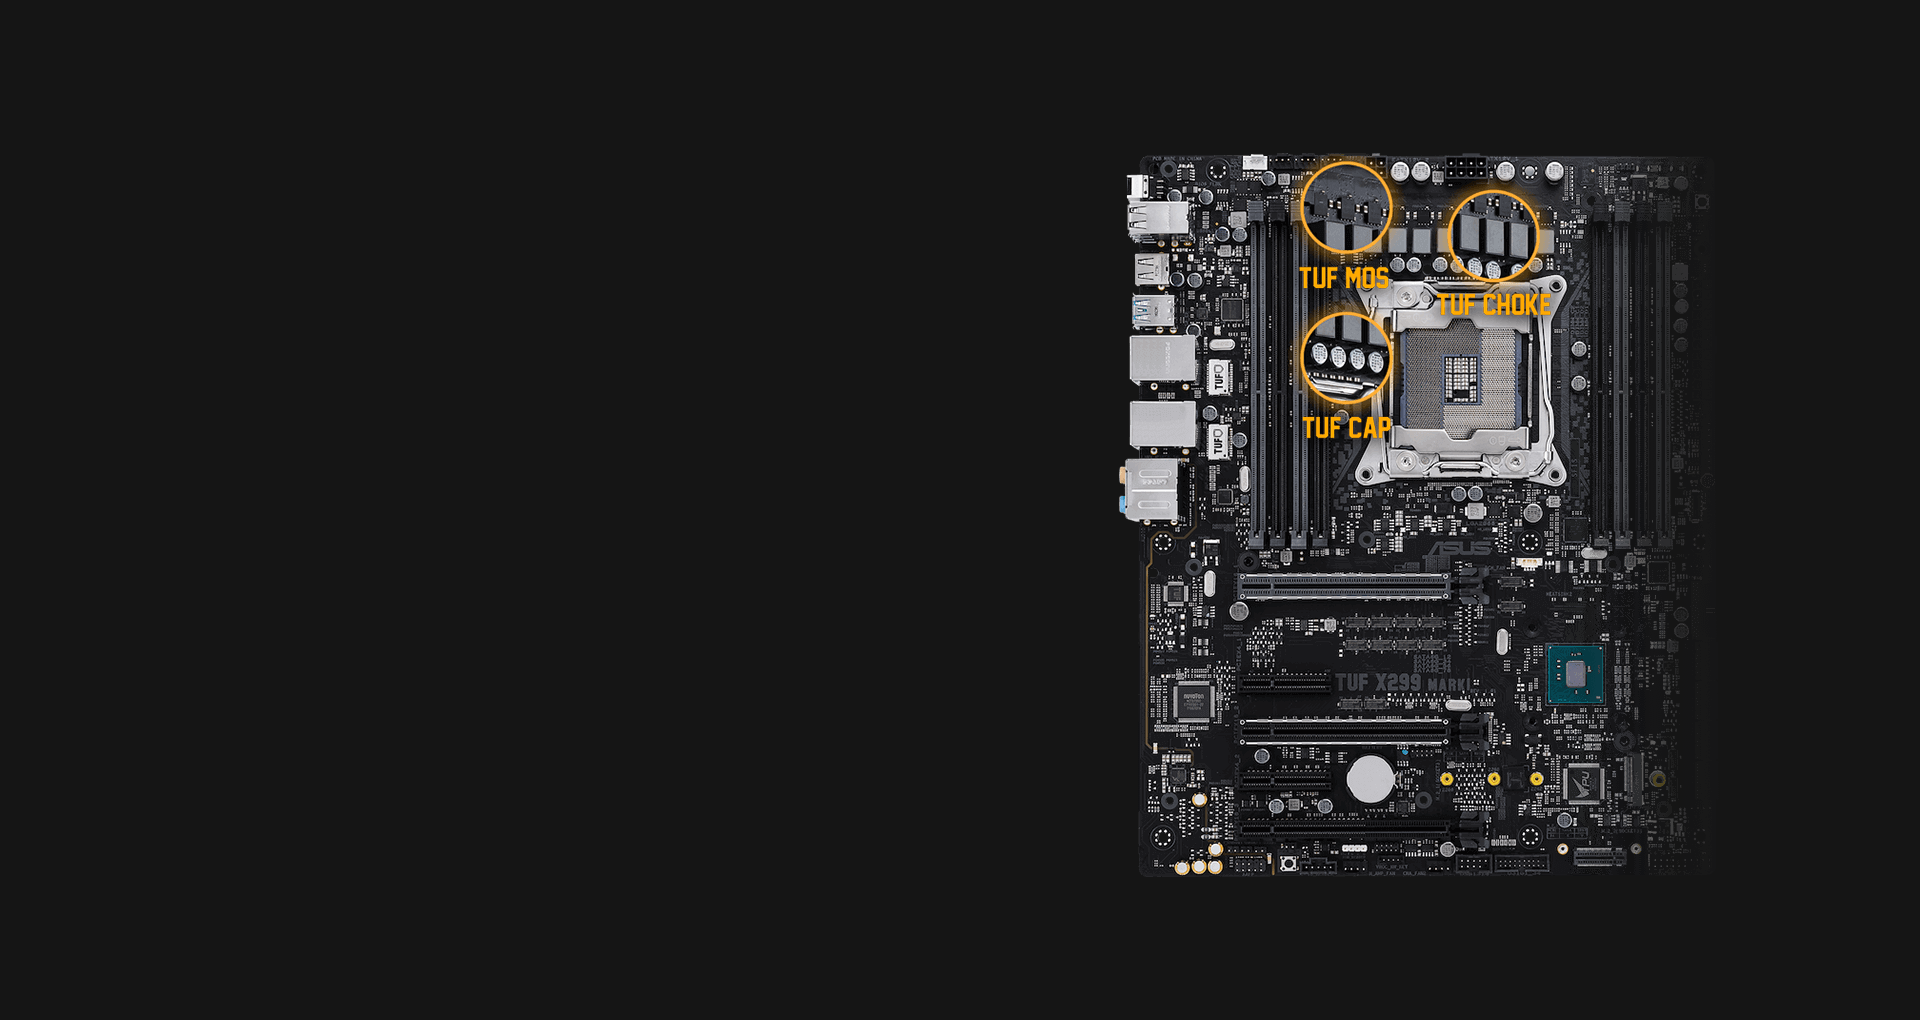 ASUS TUF X299 MARK 1 - motherboard - ATX - LGA2066 Socket - X299